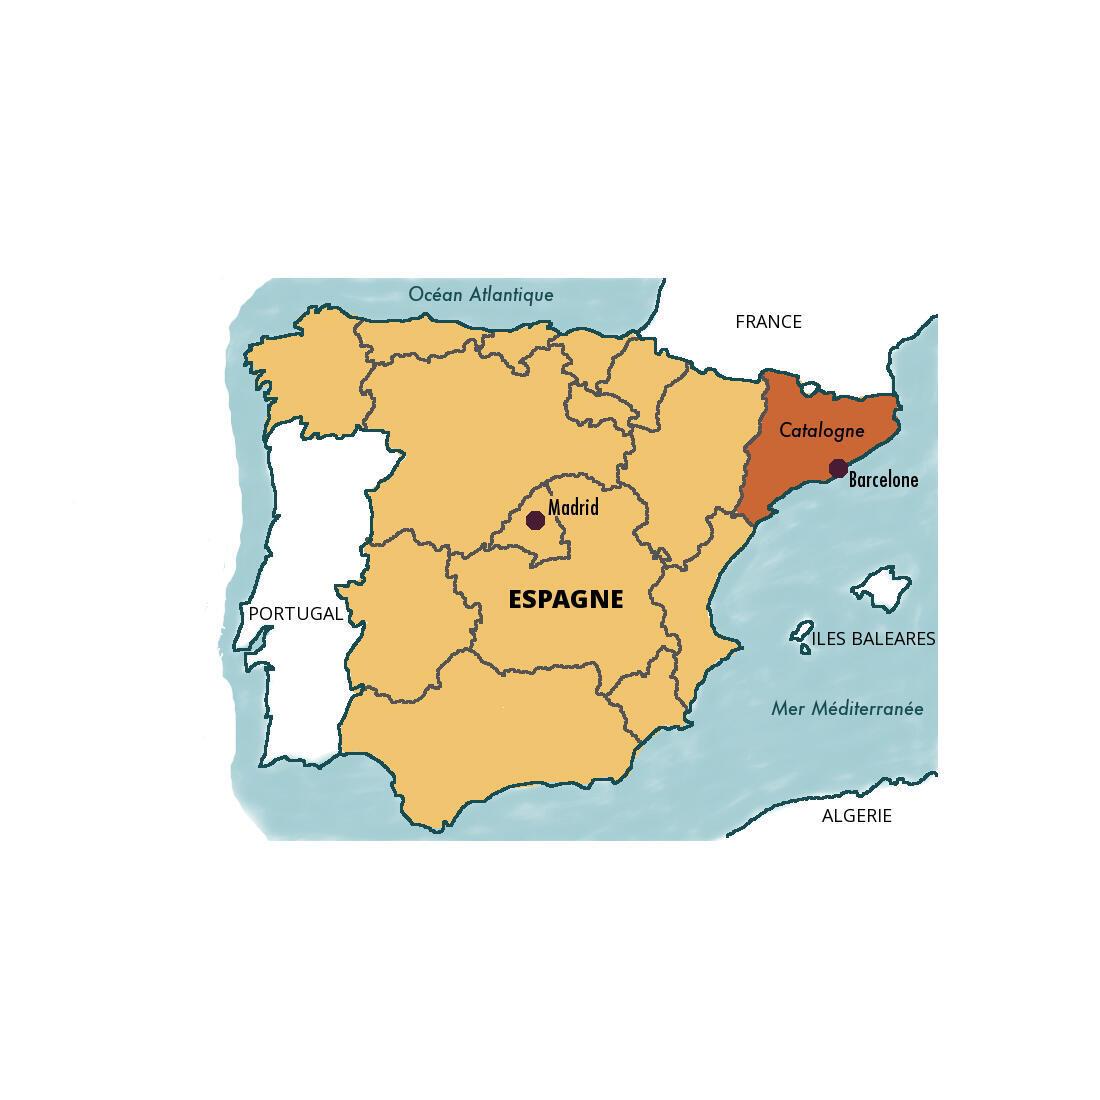 موقعیت جغرافیایی کمونته کاتالونیا بروی نقشه اسپانیا